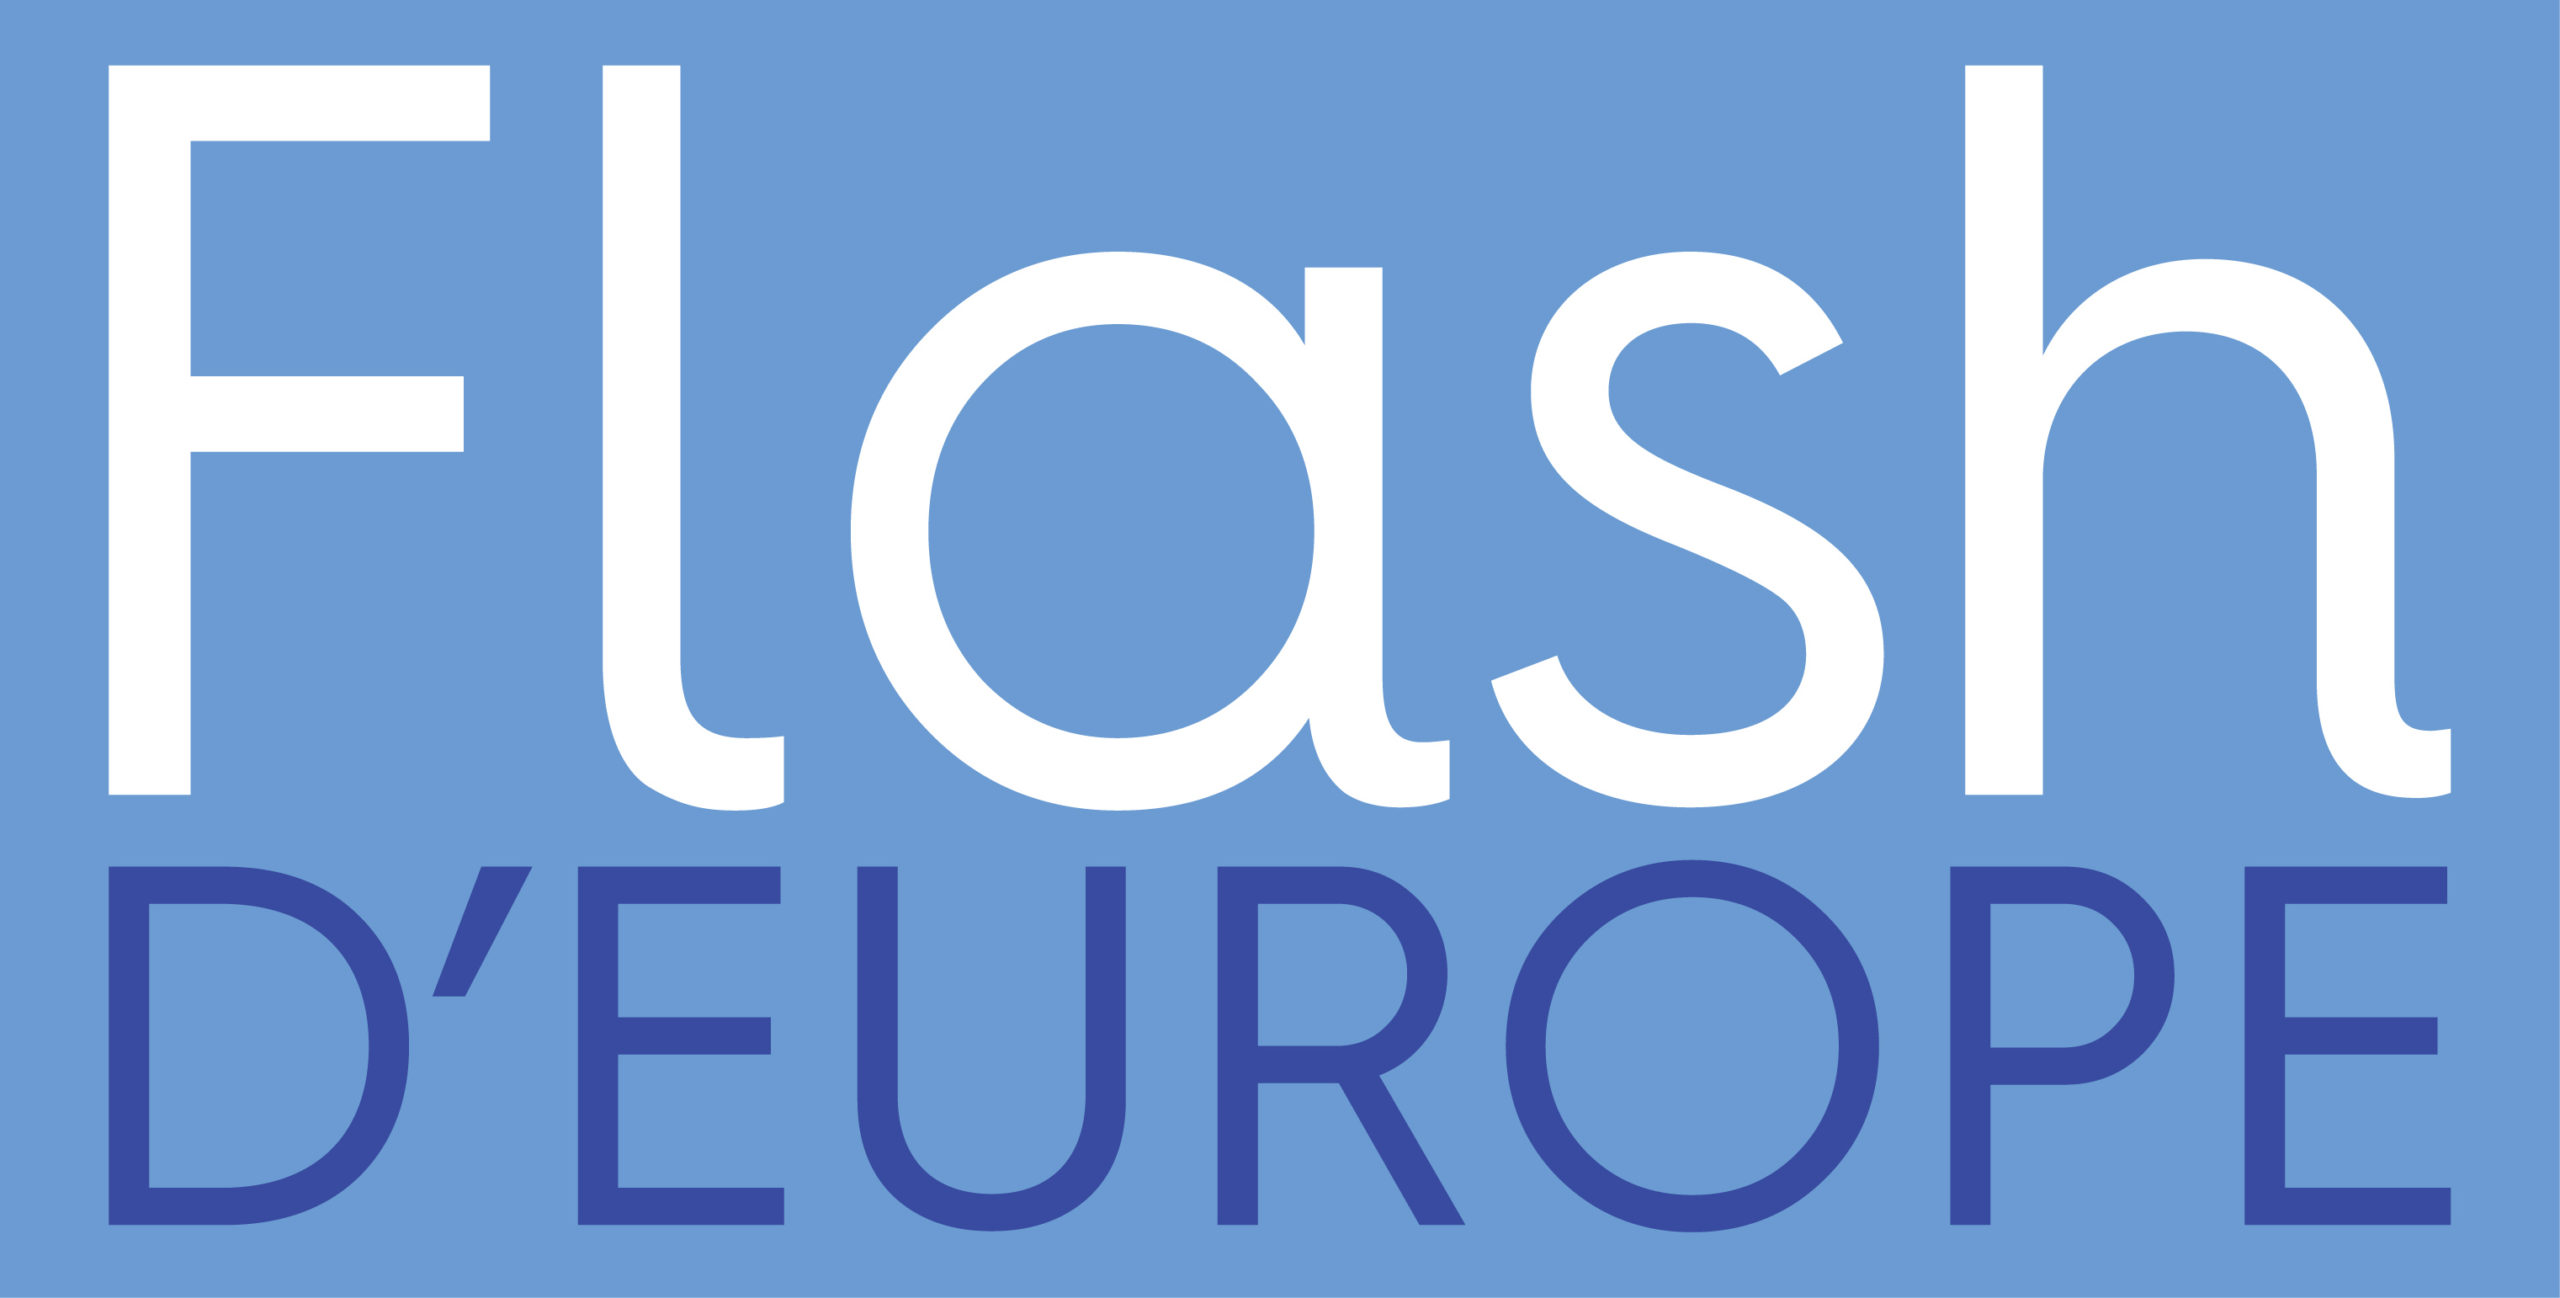 Logo Flash Europe Cadre Plan De Travail 1